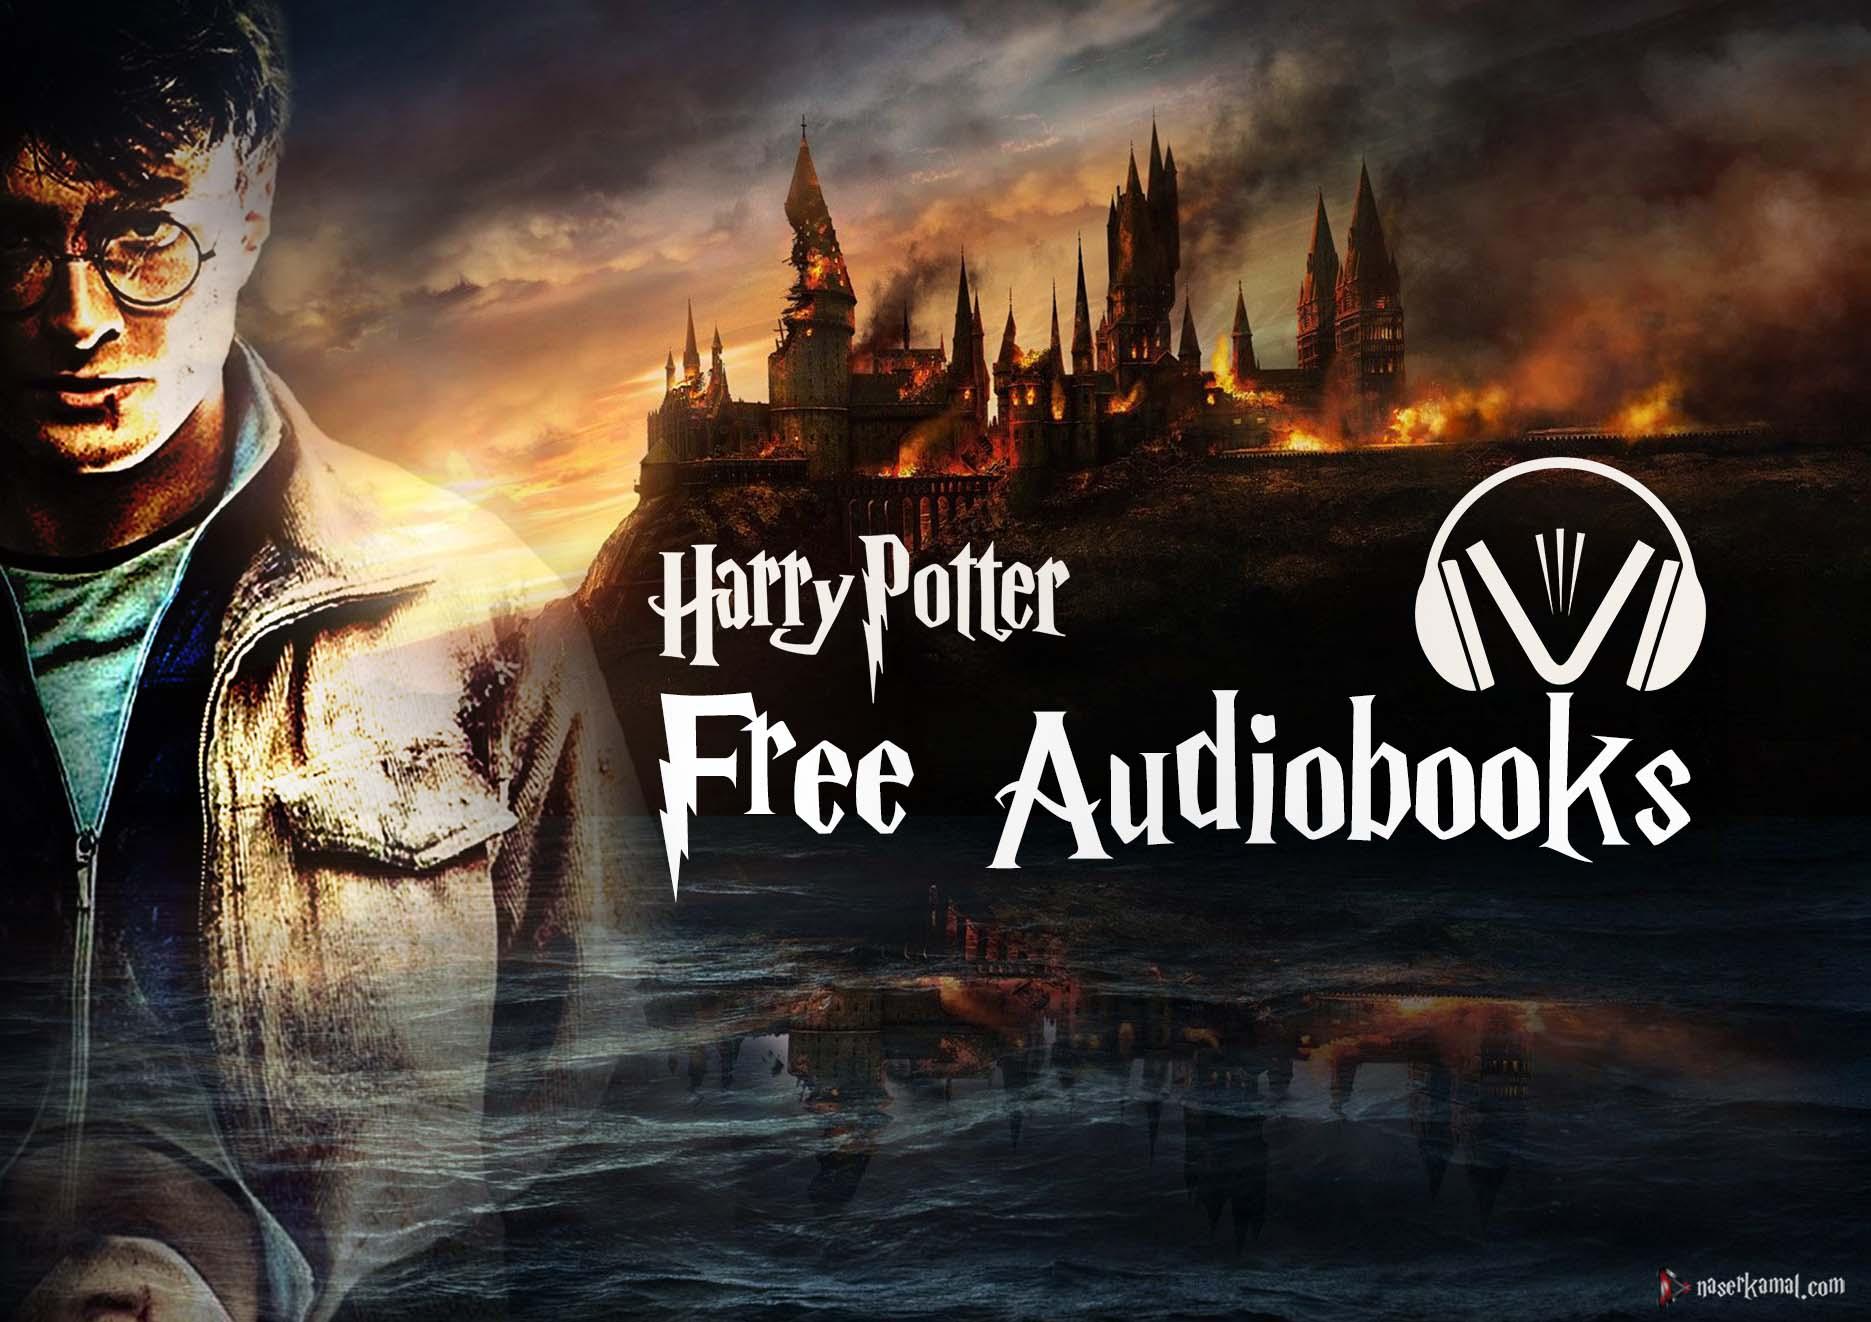 Download All Harry Potter Audiobooks For Free (Secret Methods)